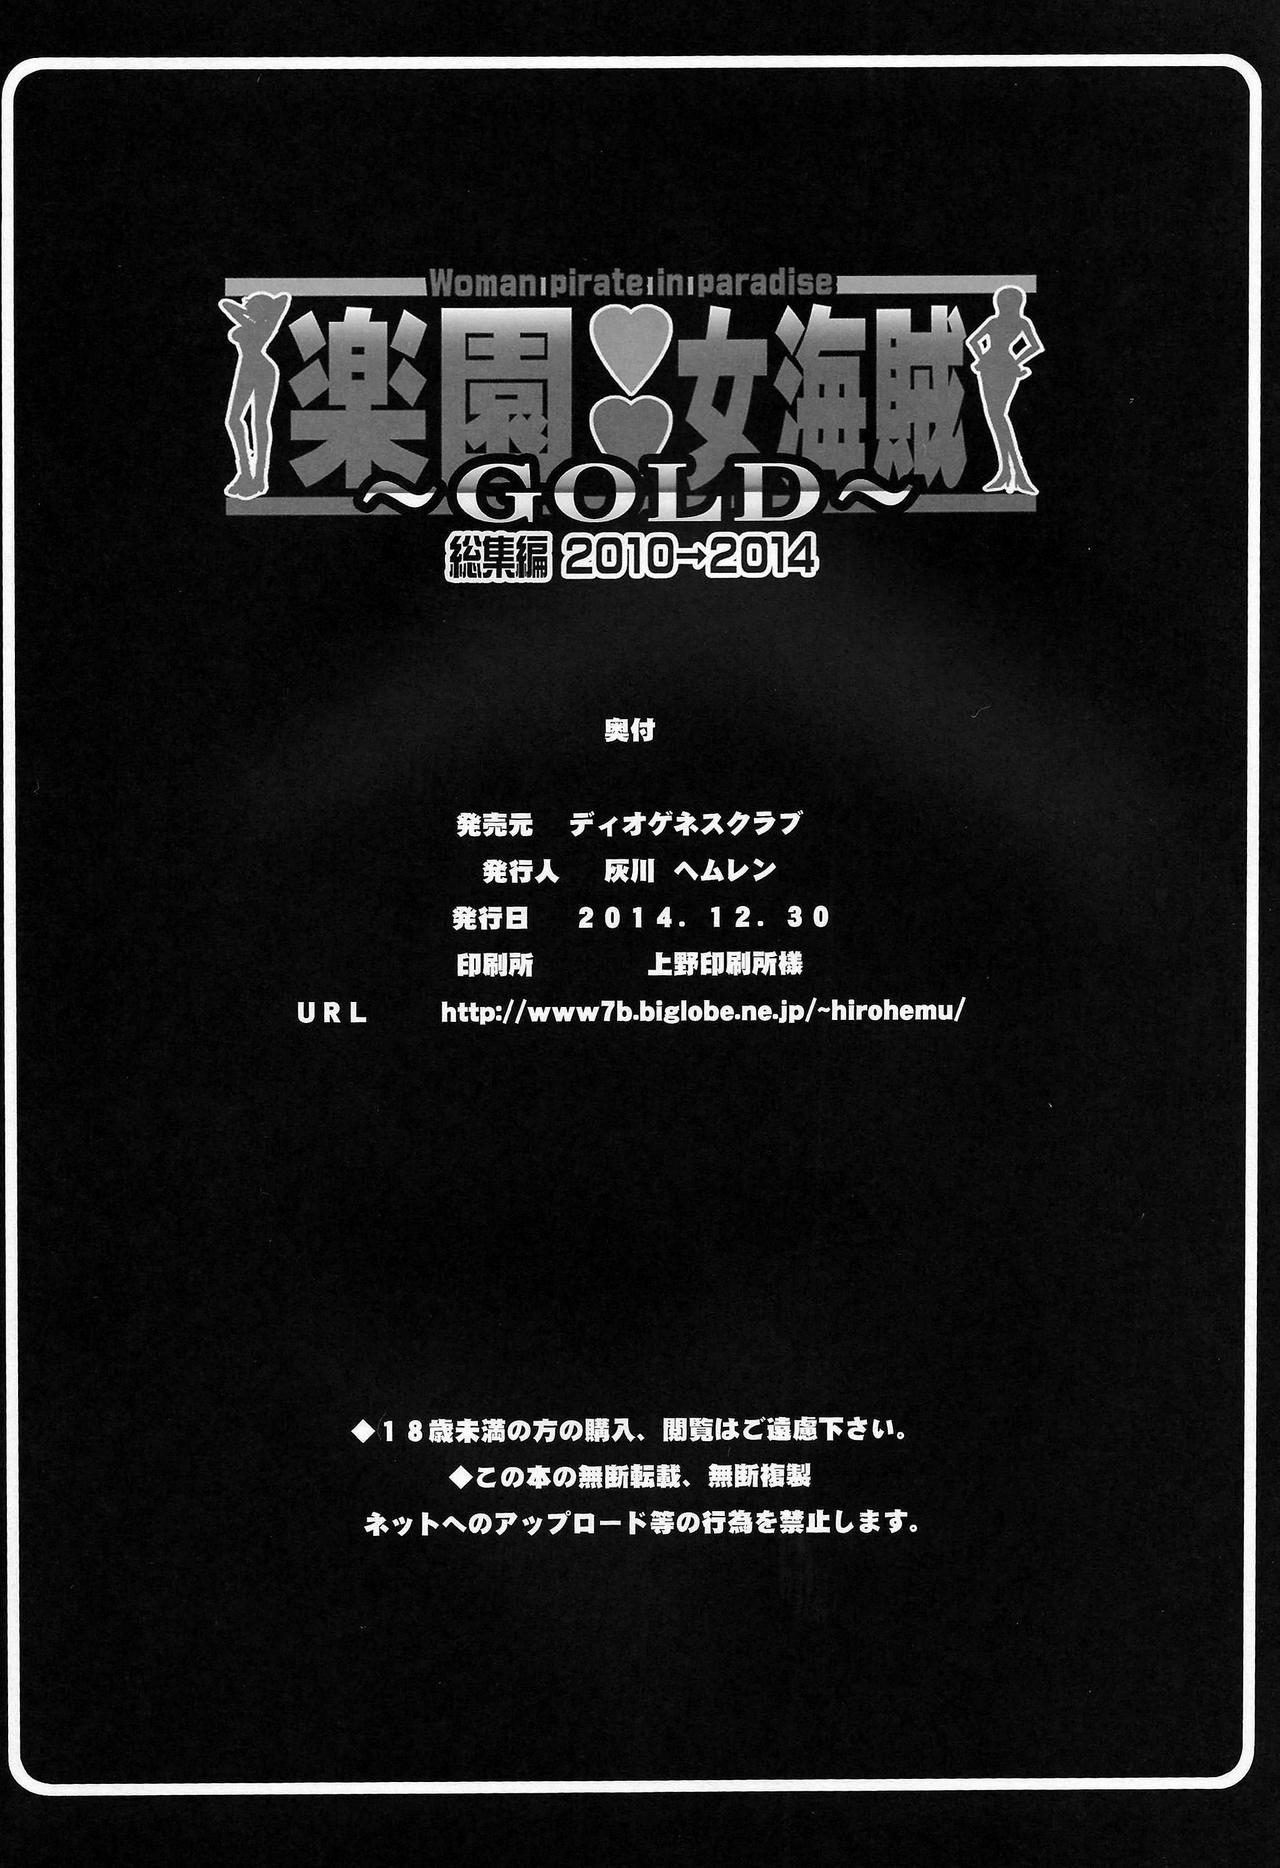 (C87) [Diogenes Club (Haikawa Hemlen)] Rakuen Onna Kaizoku Soushuuhen ~GOLD~ - Woman Pirate in Paradise (One Piece) [Chinese] [D狗汉化] 11